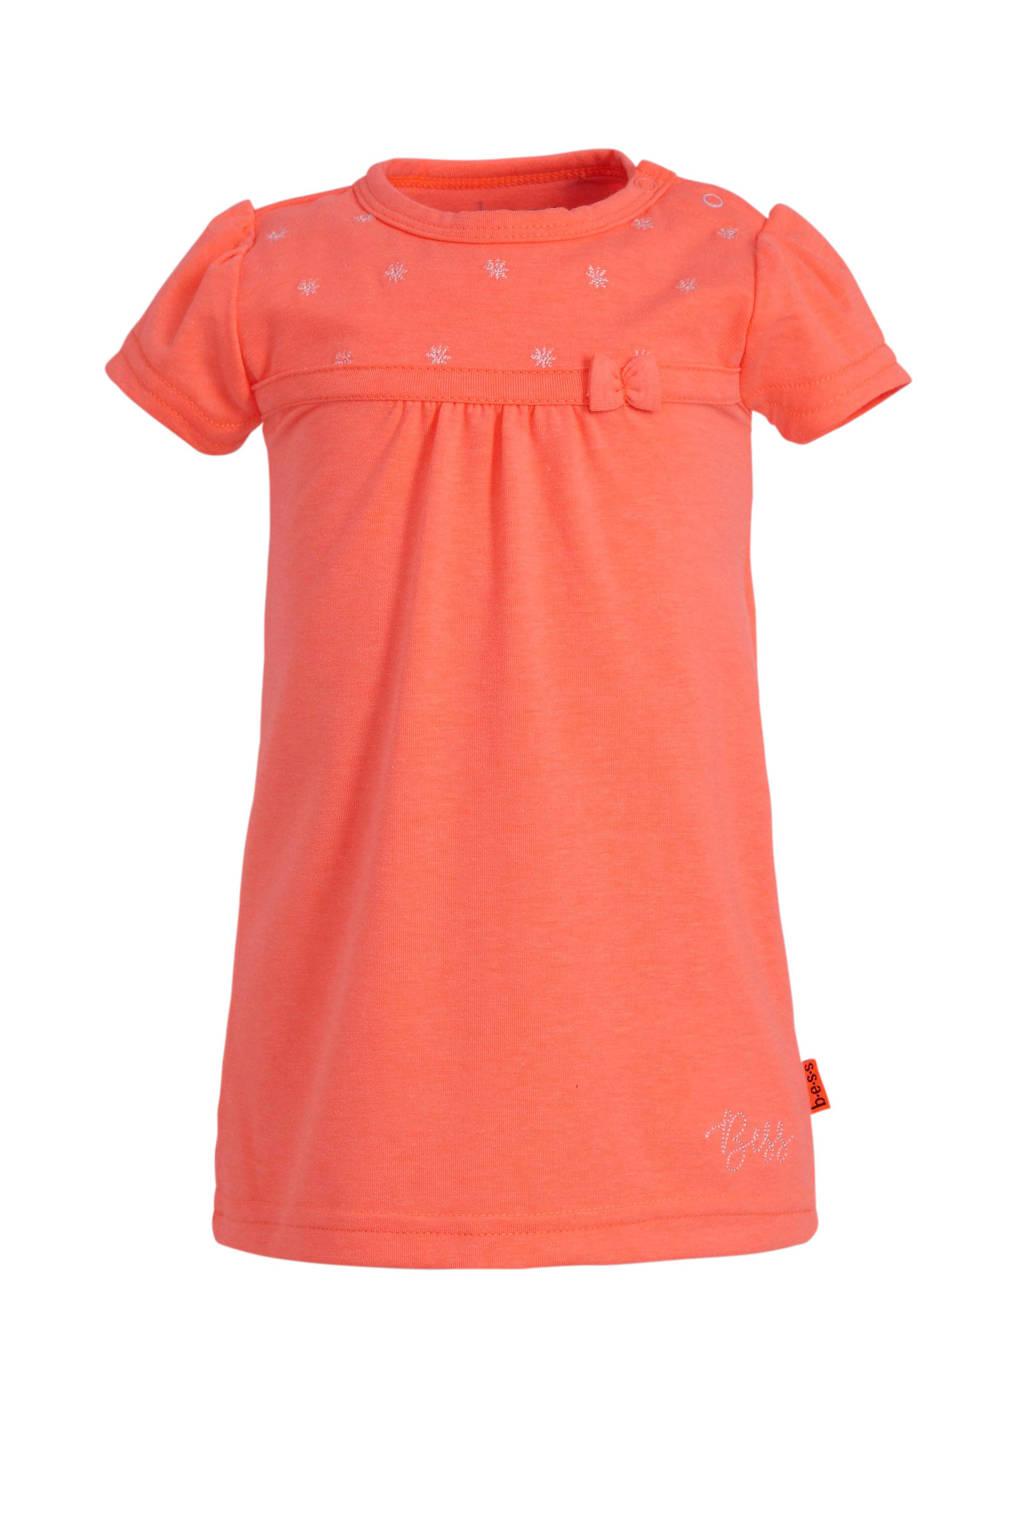 B.E.S.S jersey jurk met borduursels koraalrood, Oranje